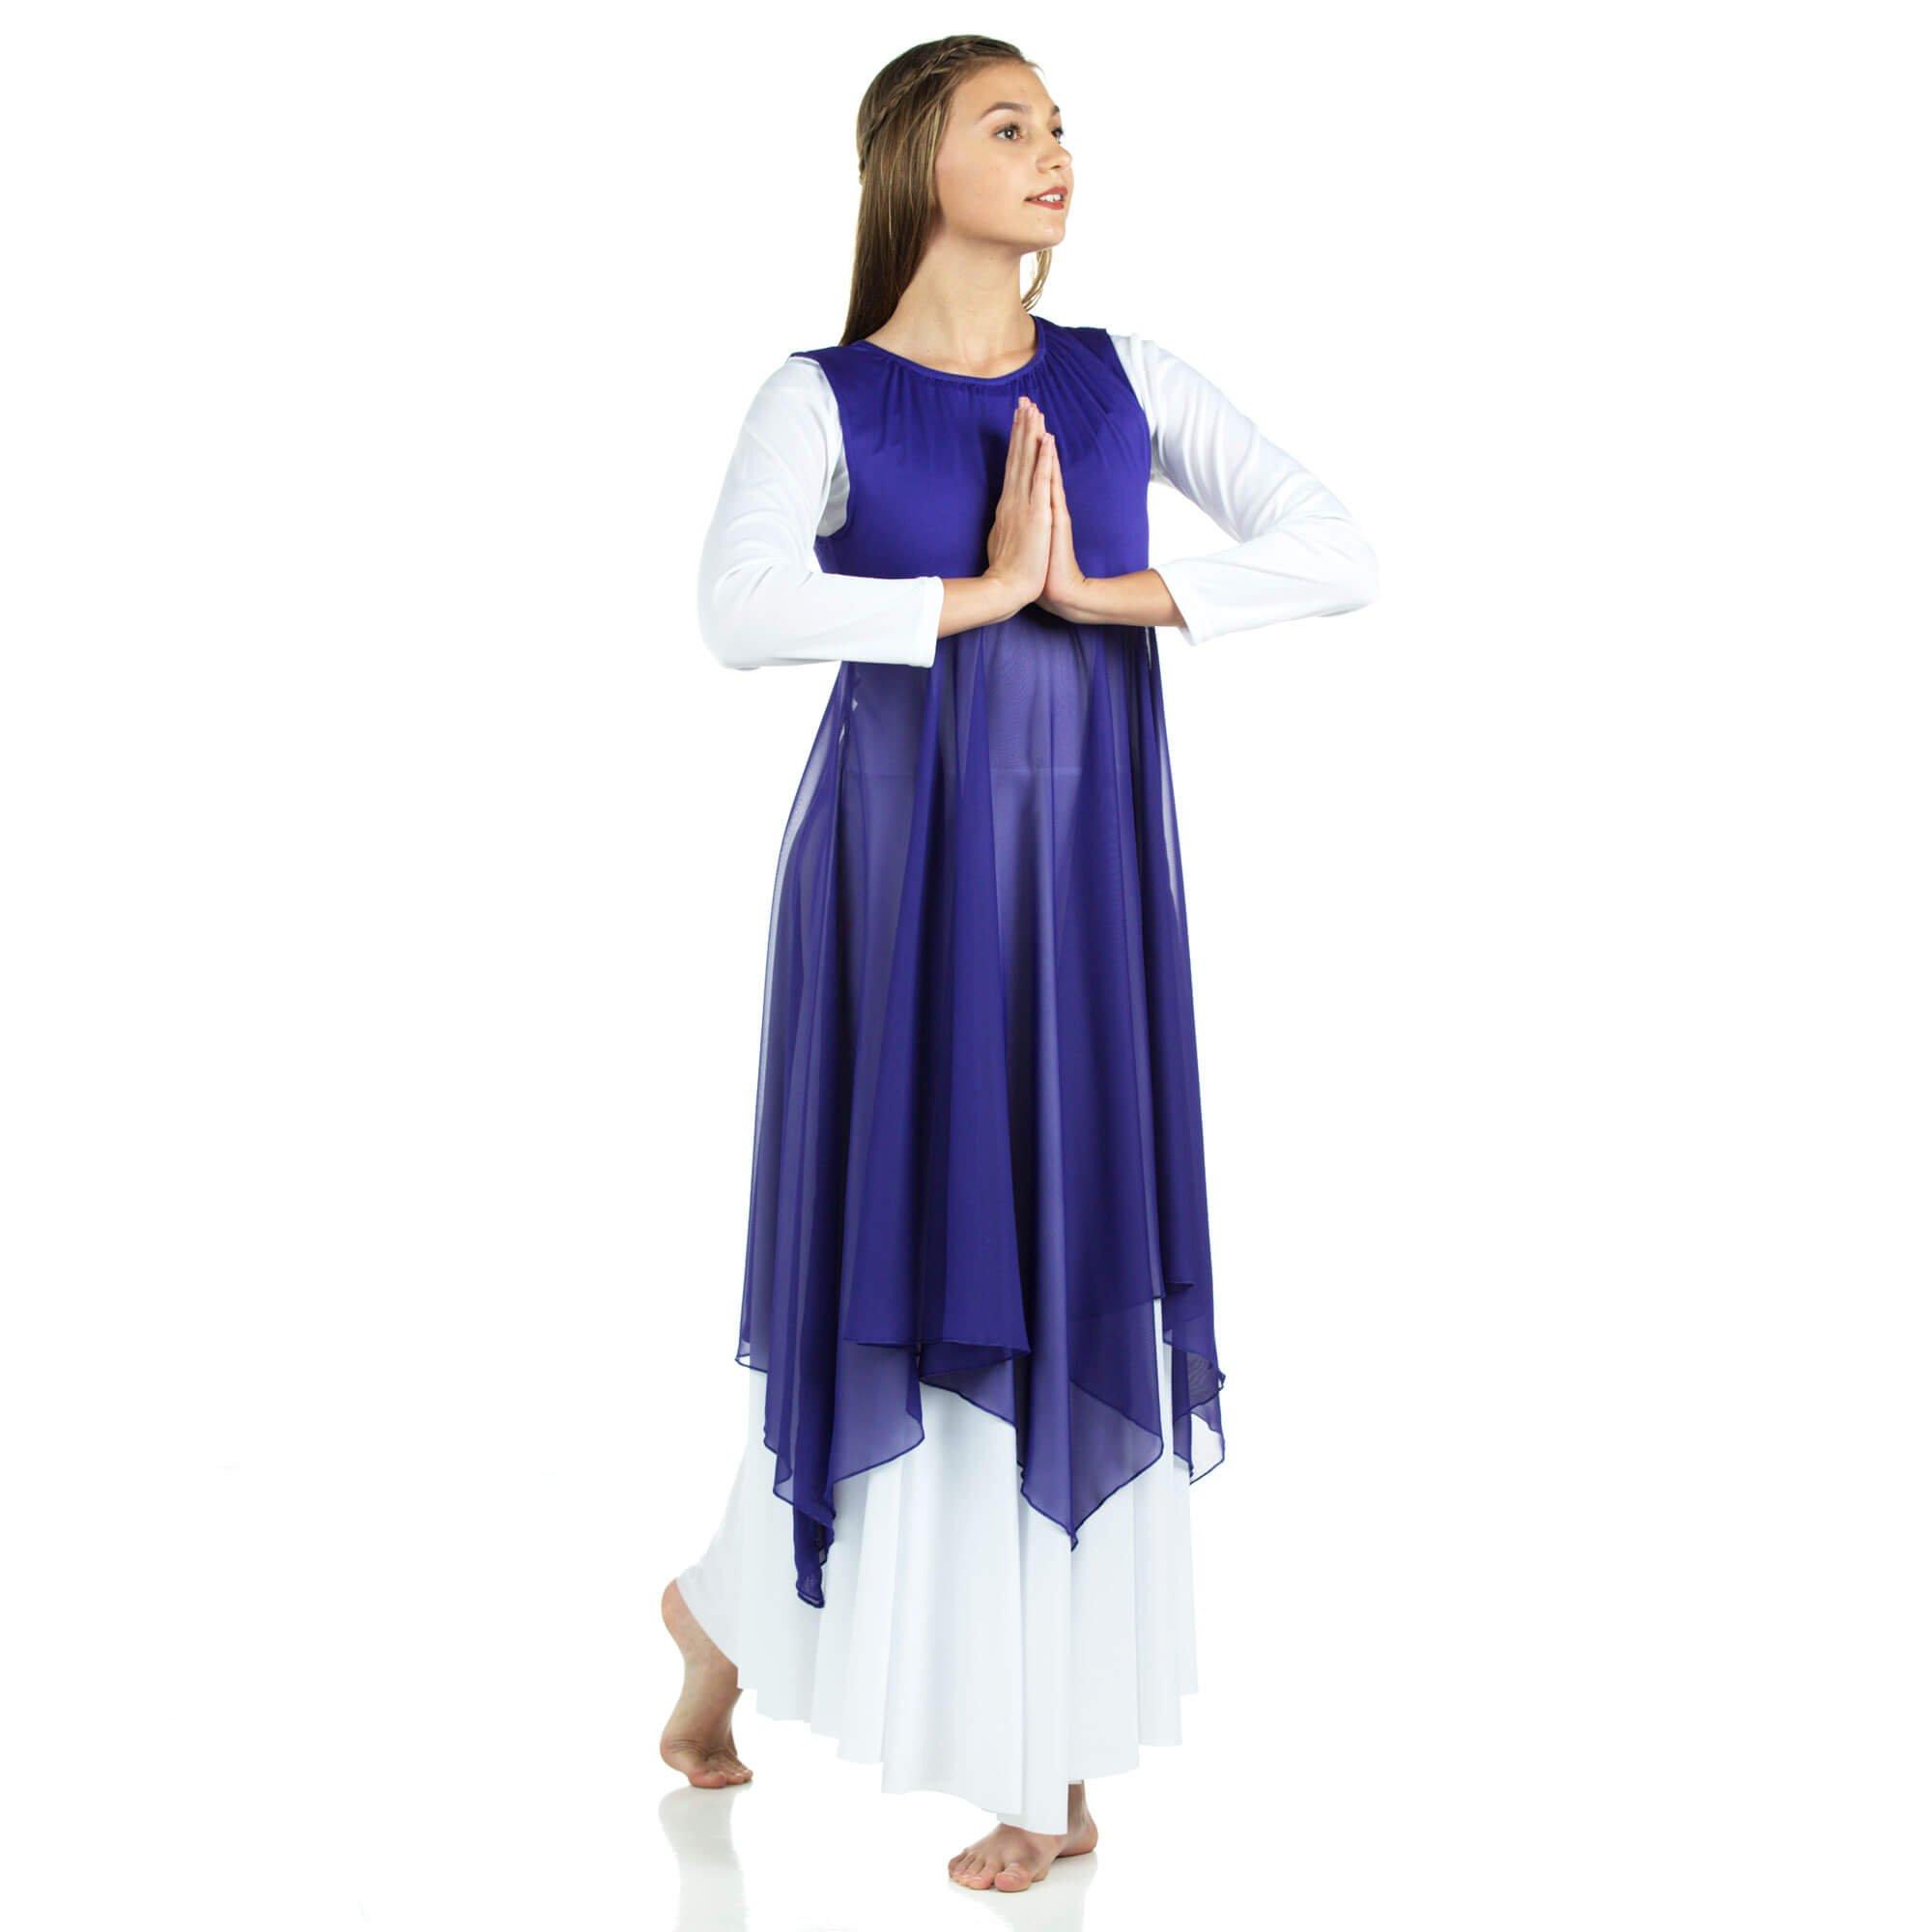 cbc9686eea7c ... Dress Order Discount Praise Dance Dresses: Danzcue: Discount Dance,  Angel Wings, Dance Costumes